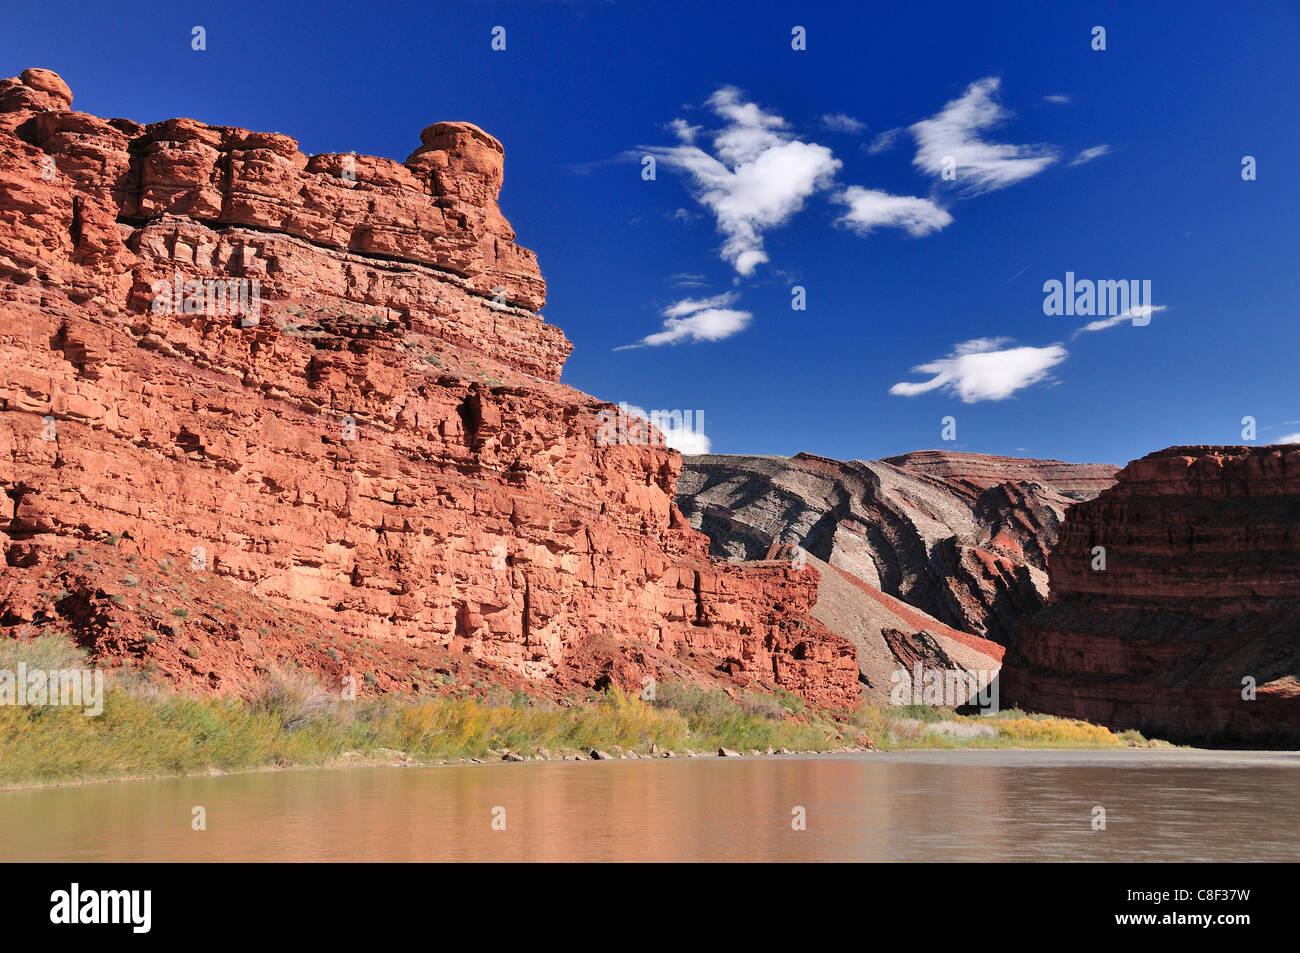 Cliffs, San Juan River, near Bluff, Colorado Plateau, Utah, USA, United States, America, - Stock Image